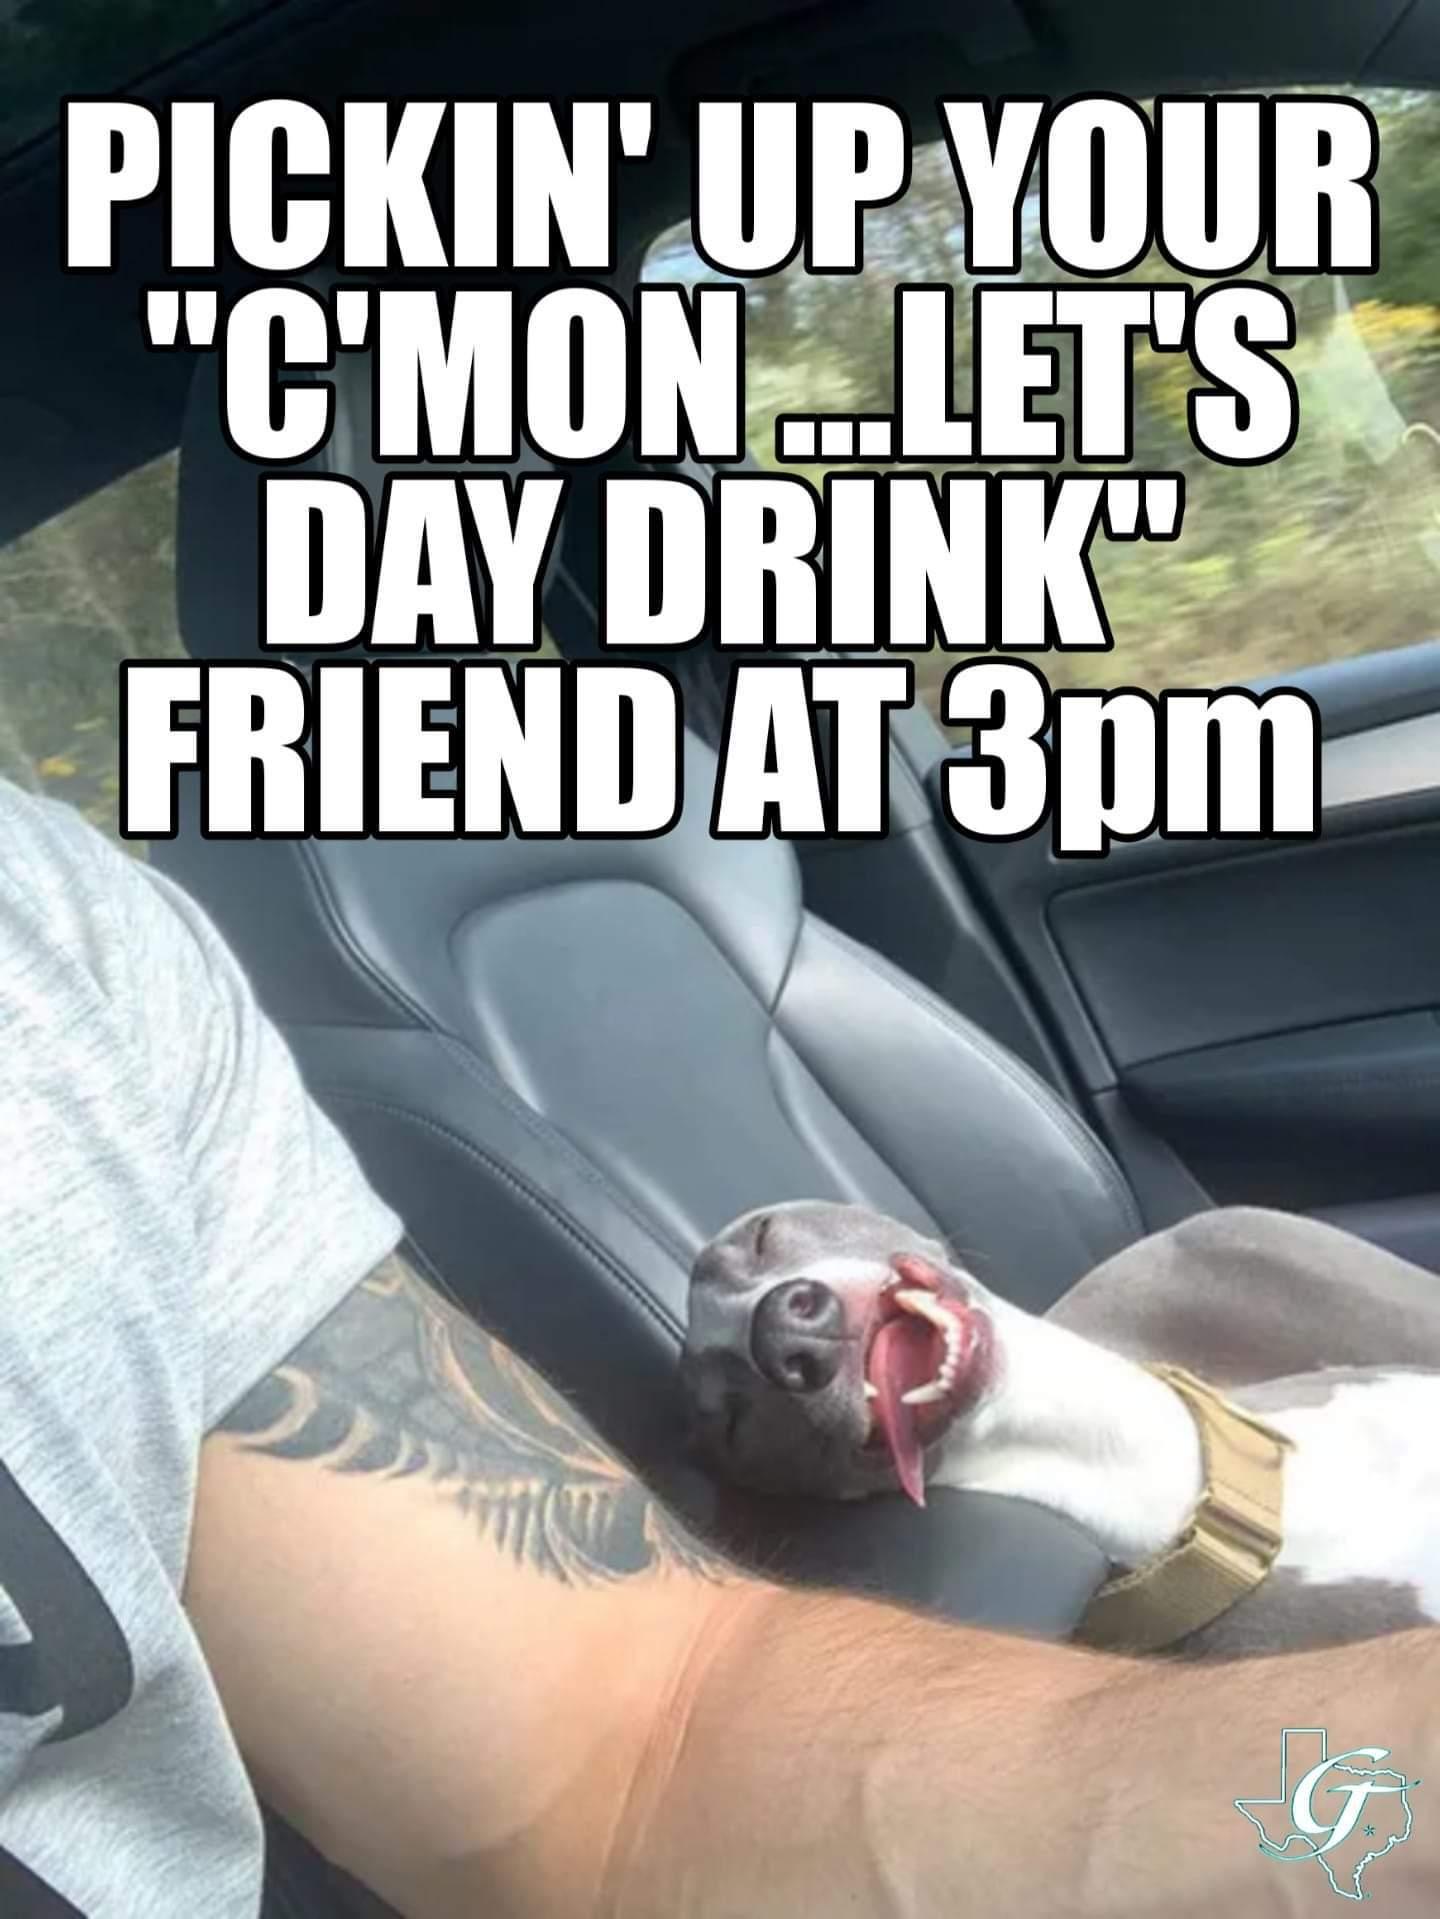 That one friend - meme